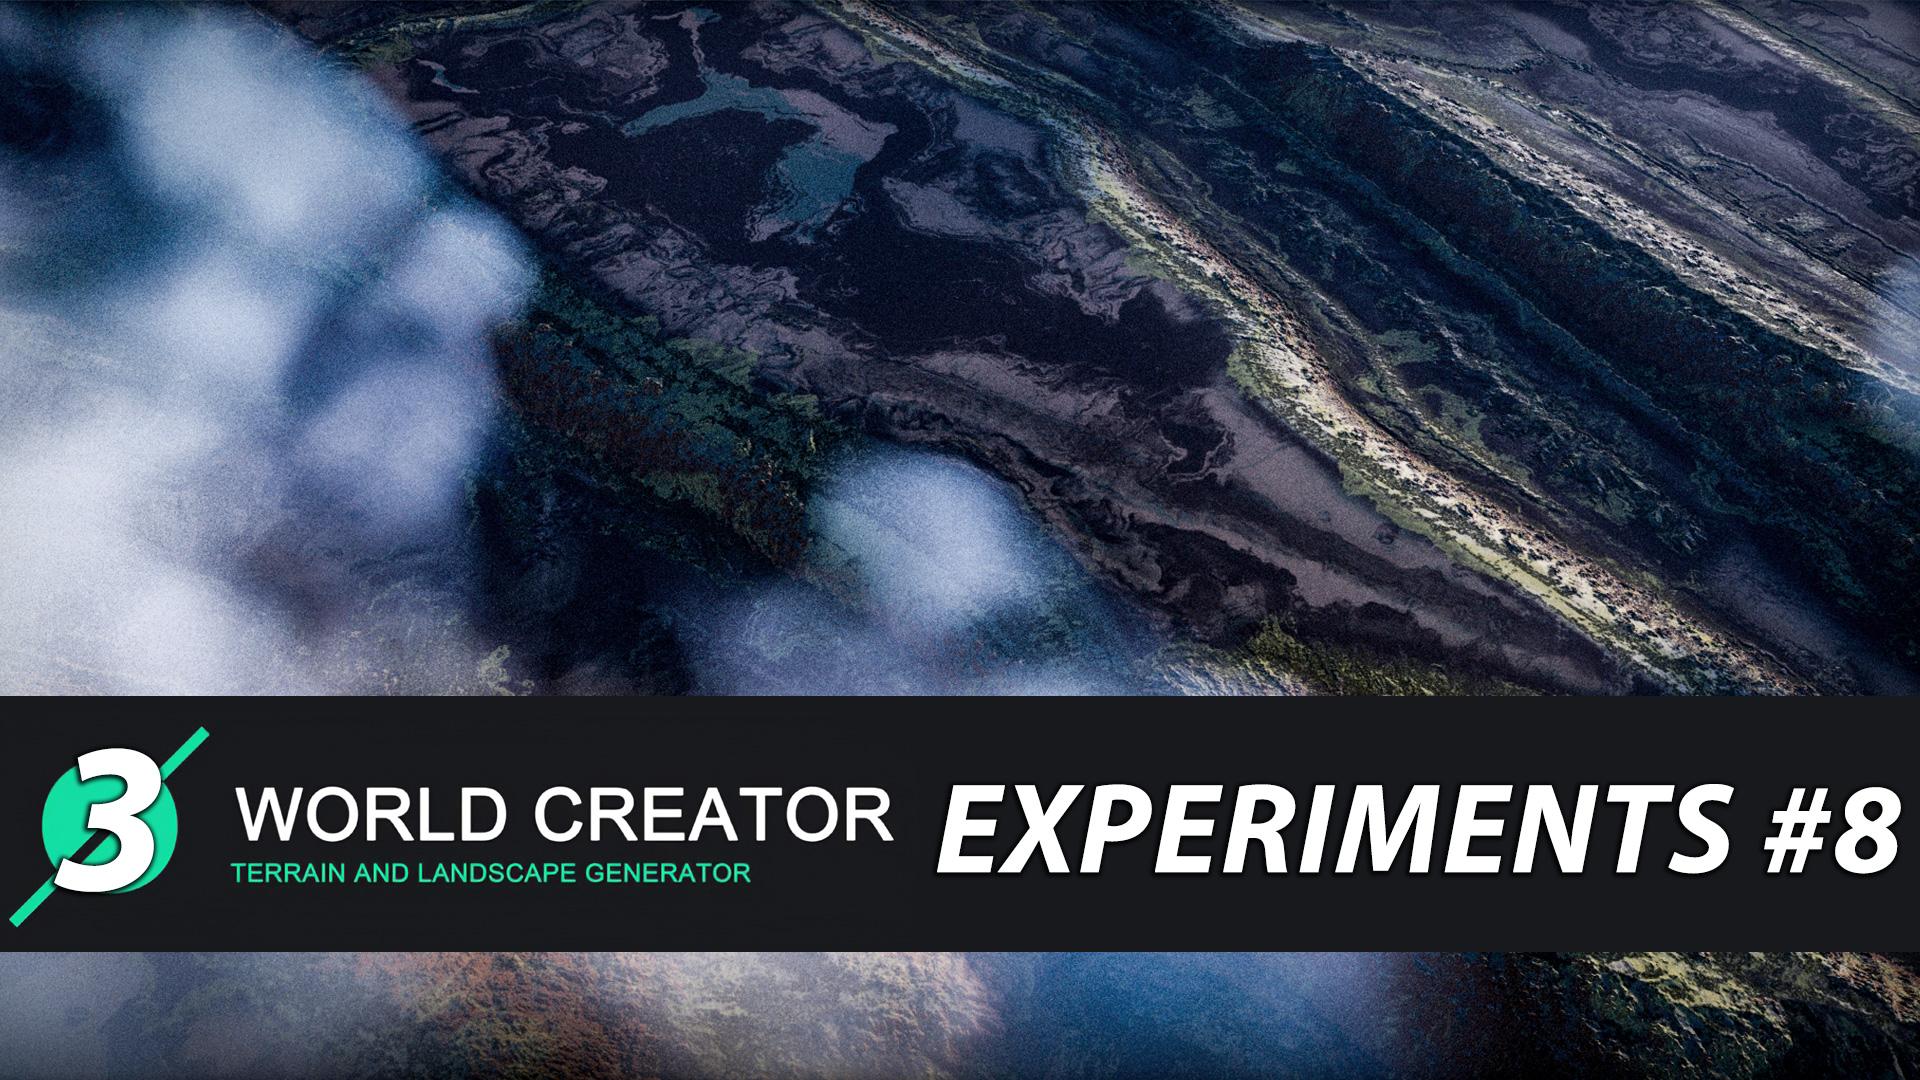 WC3_EXPERIMENTS_youtube_8.jpg